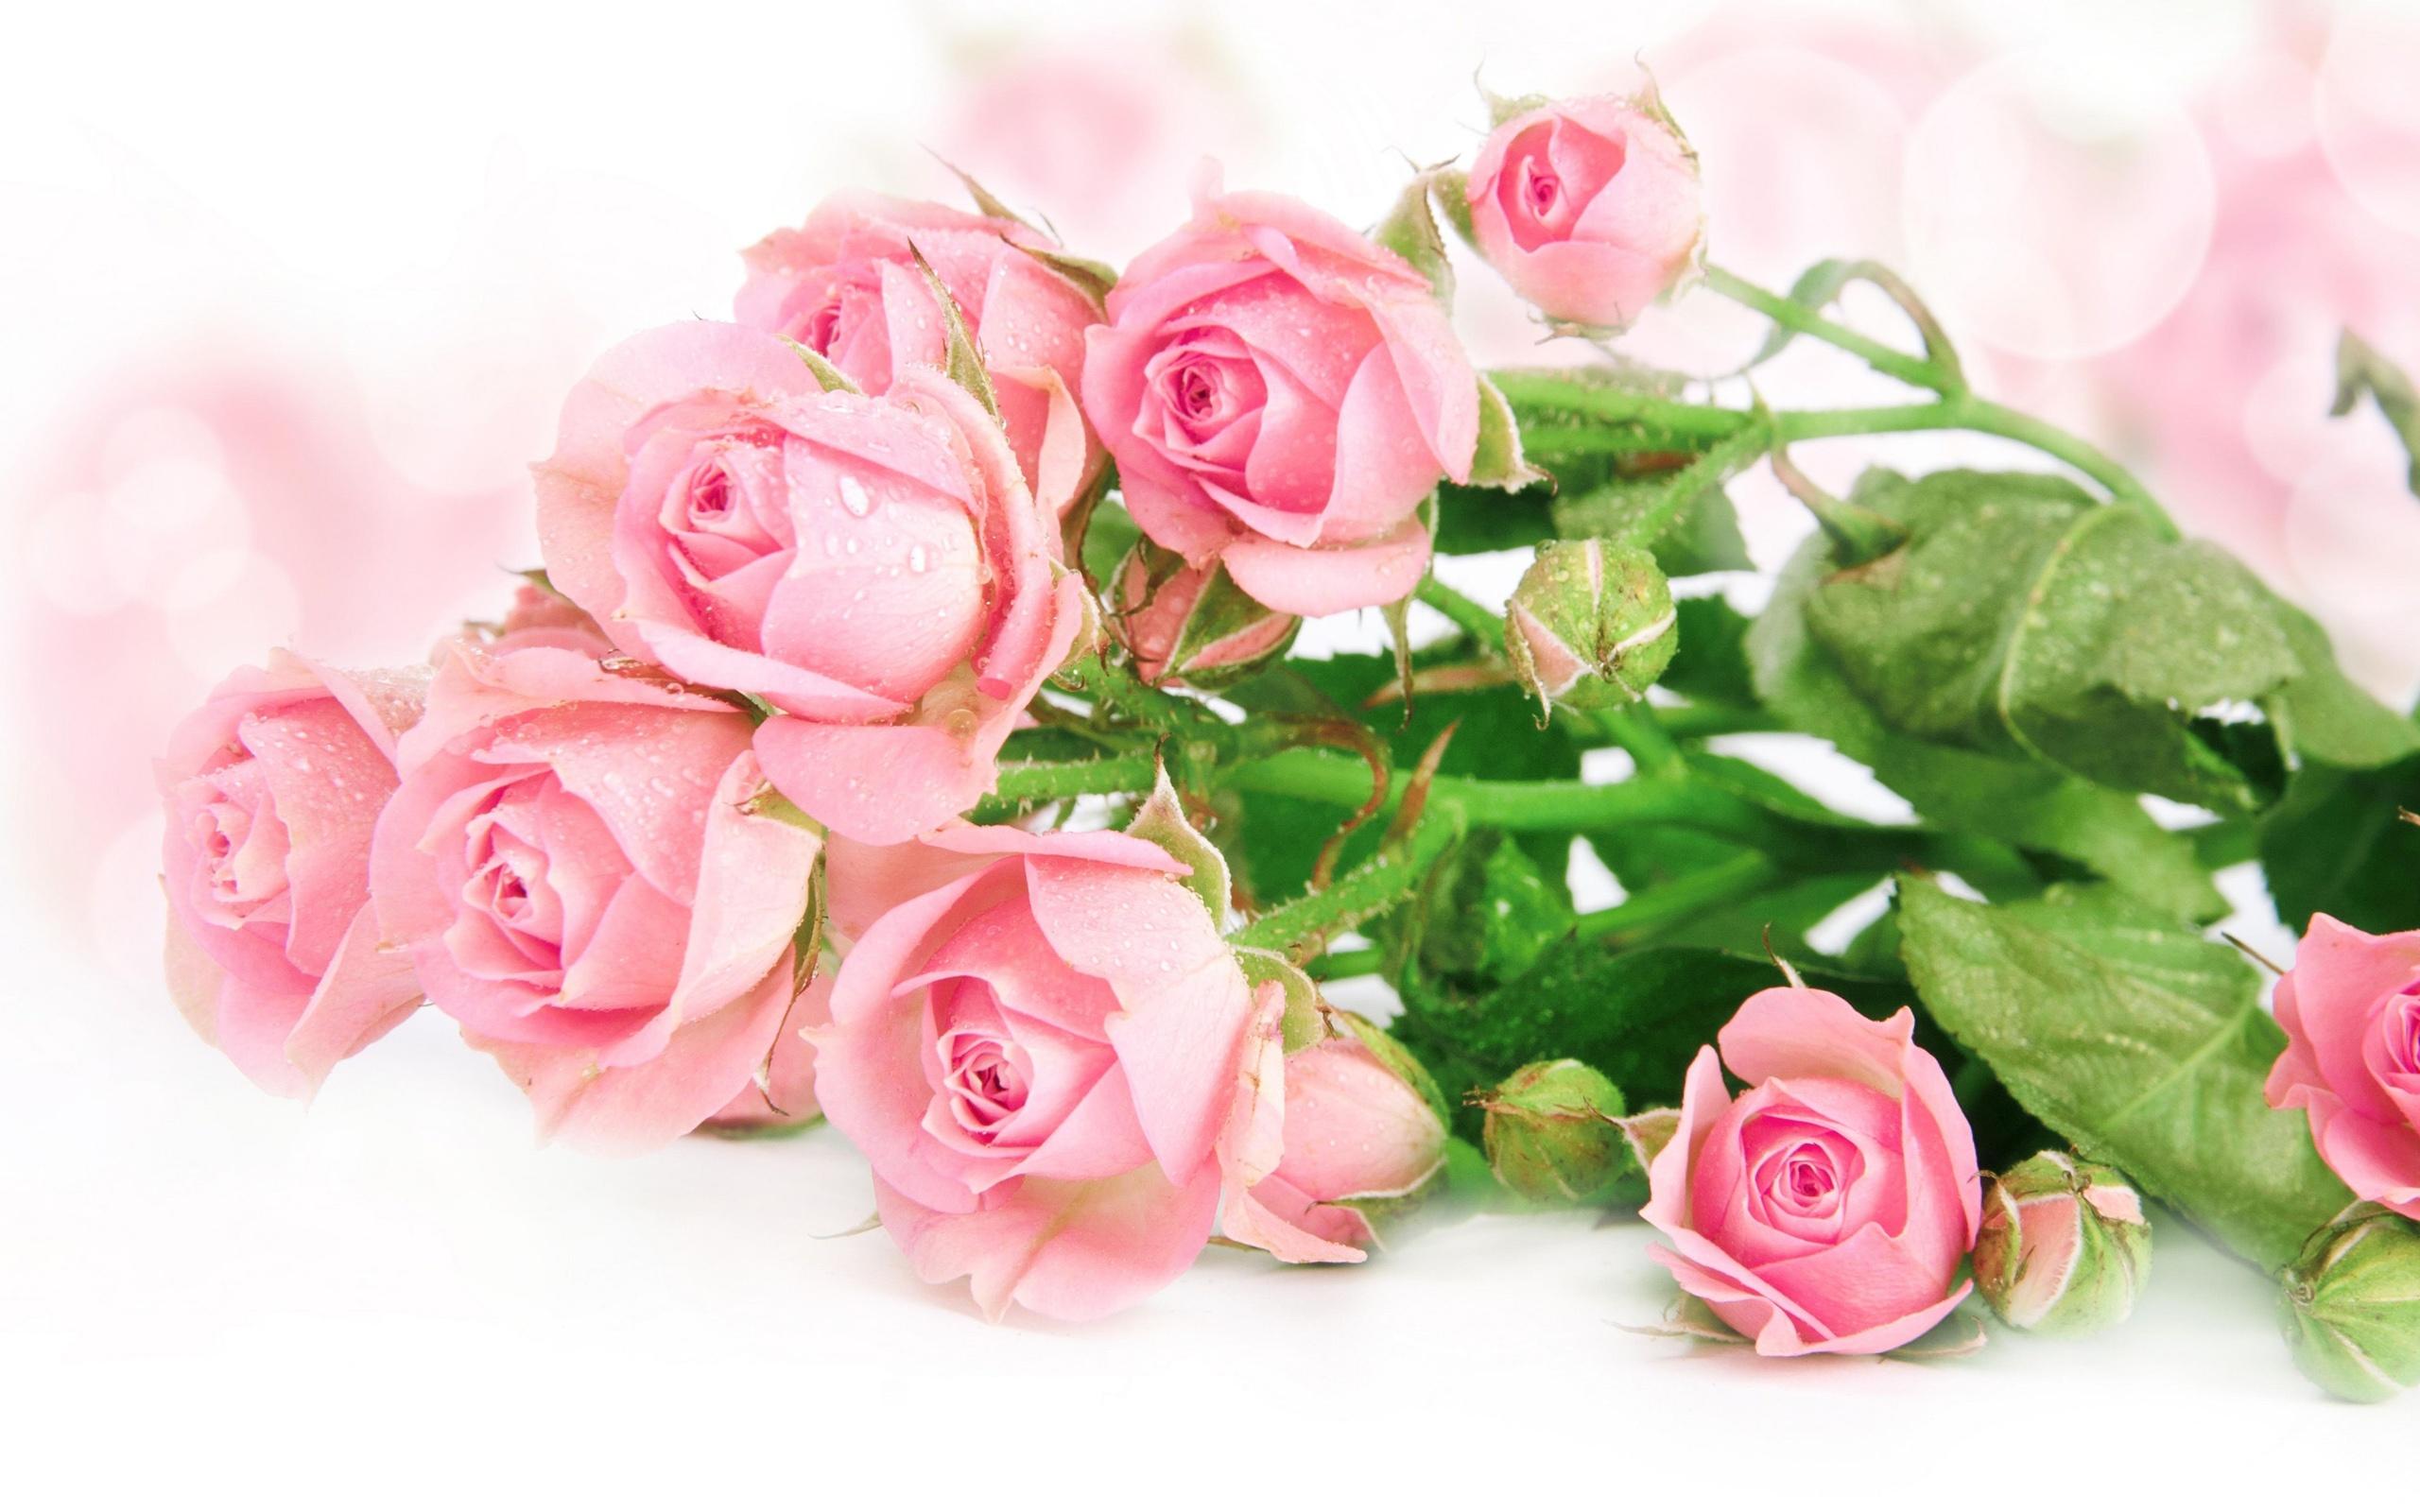 frische rosa rosen hintergrundbilder 2560x1600 hintergrundbilder download de best wallpaper net. Black Bedroom Furniture Sets. Home Design Ideas